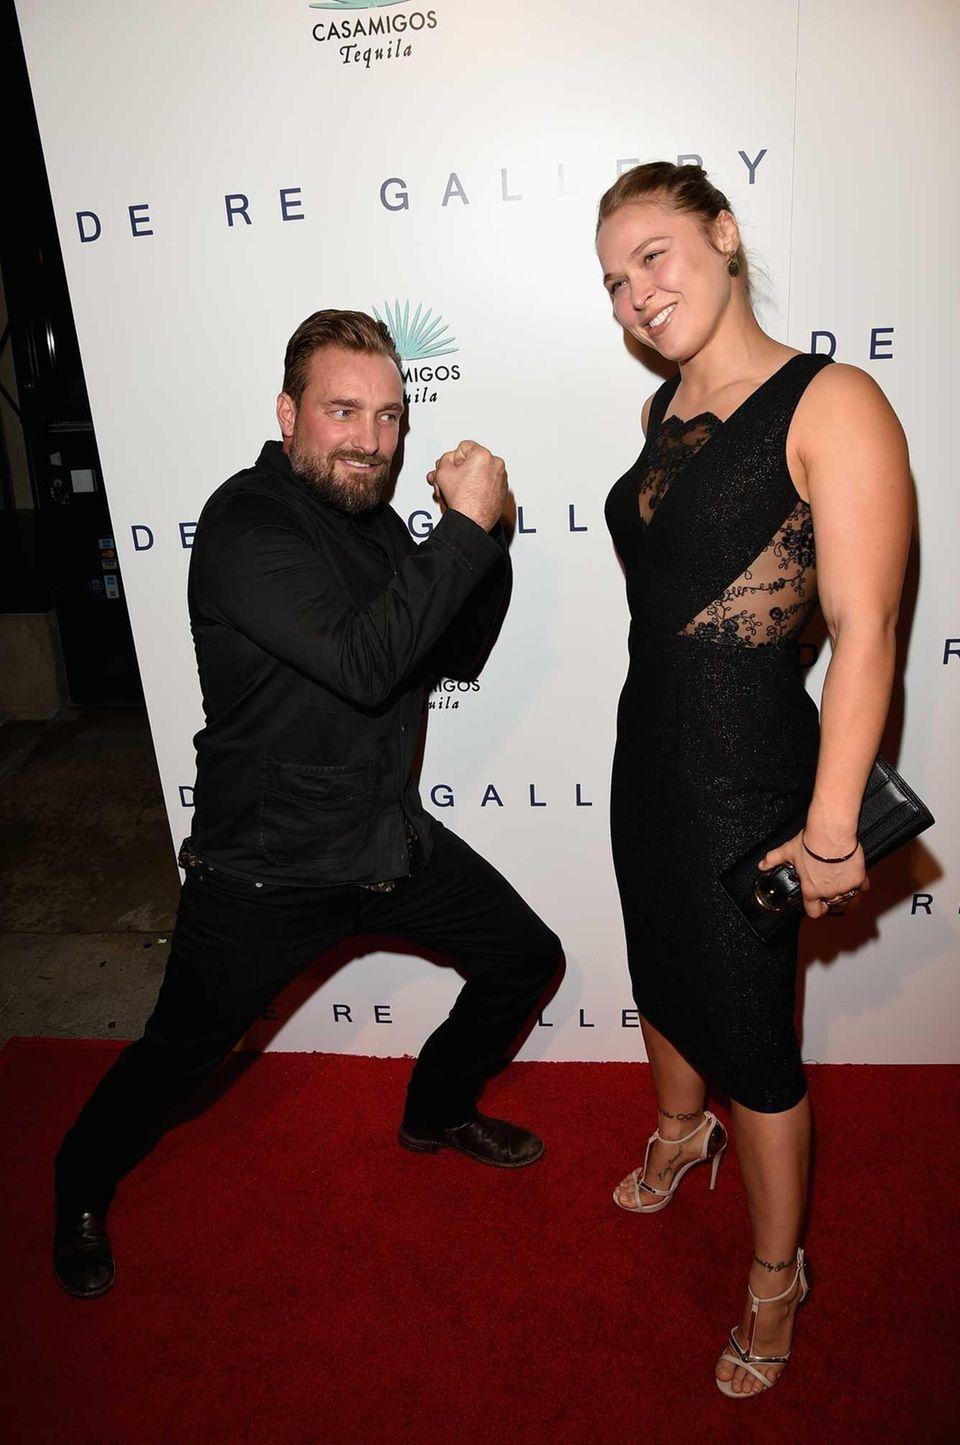 WEST HOLLYWOOD, CA - OCTOBER 23: UFC fighter